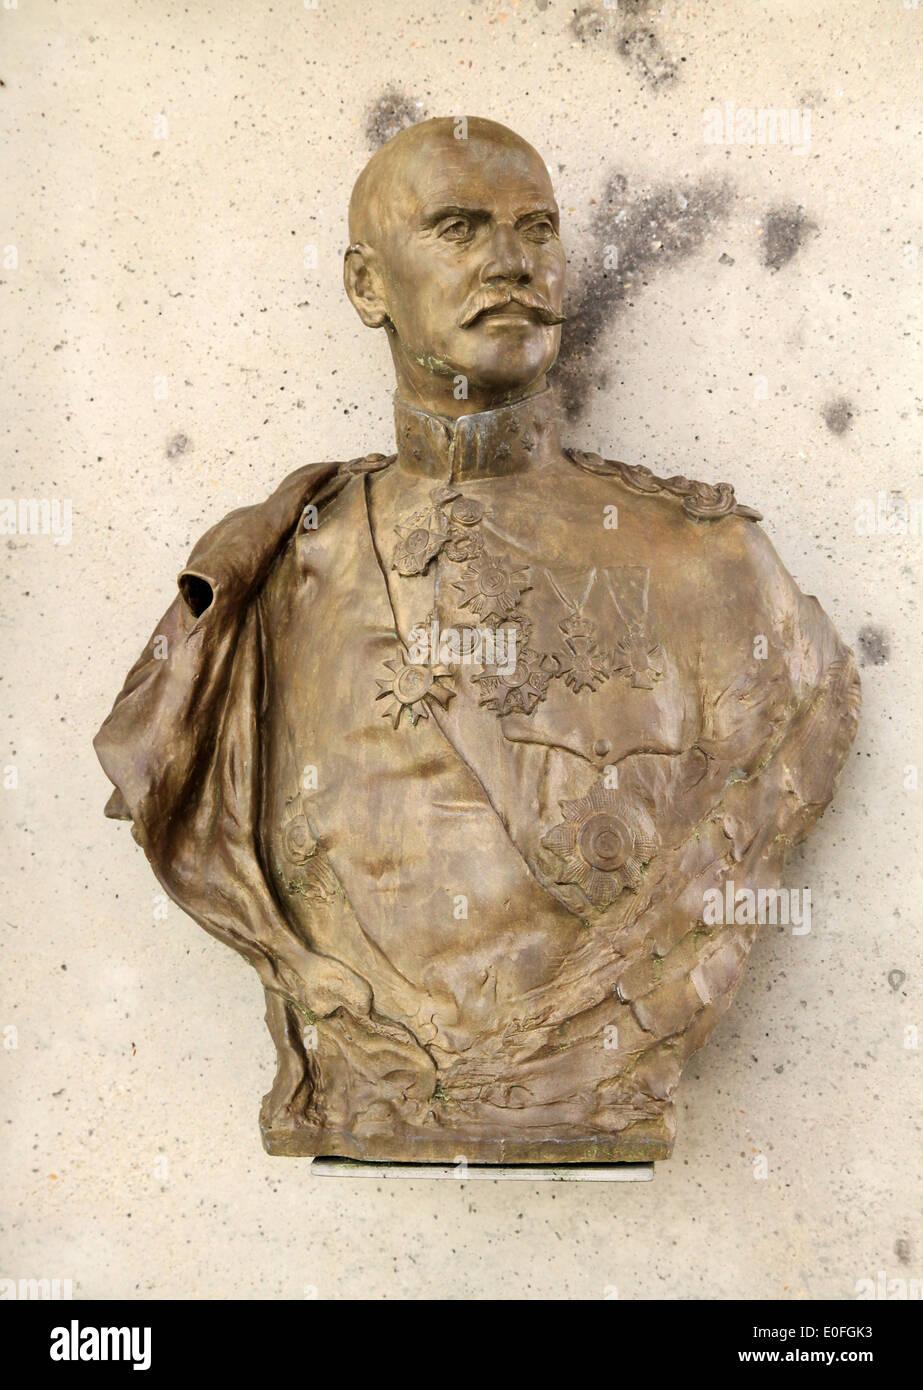 Statue of general Baron Jacques de Dixmude.War hero of Stavelot.1914-1918.Belgium. Stock Photo